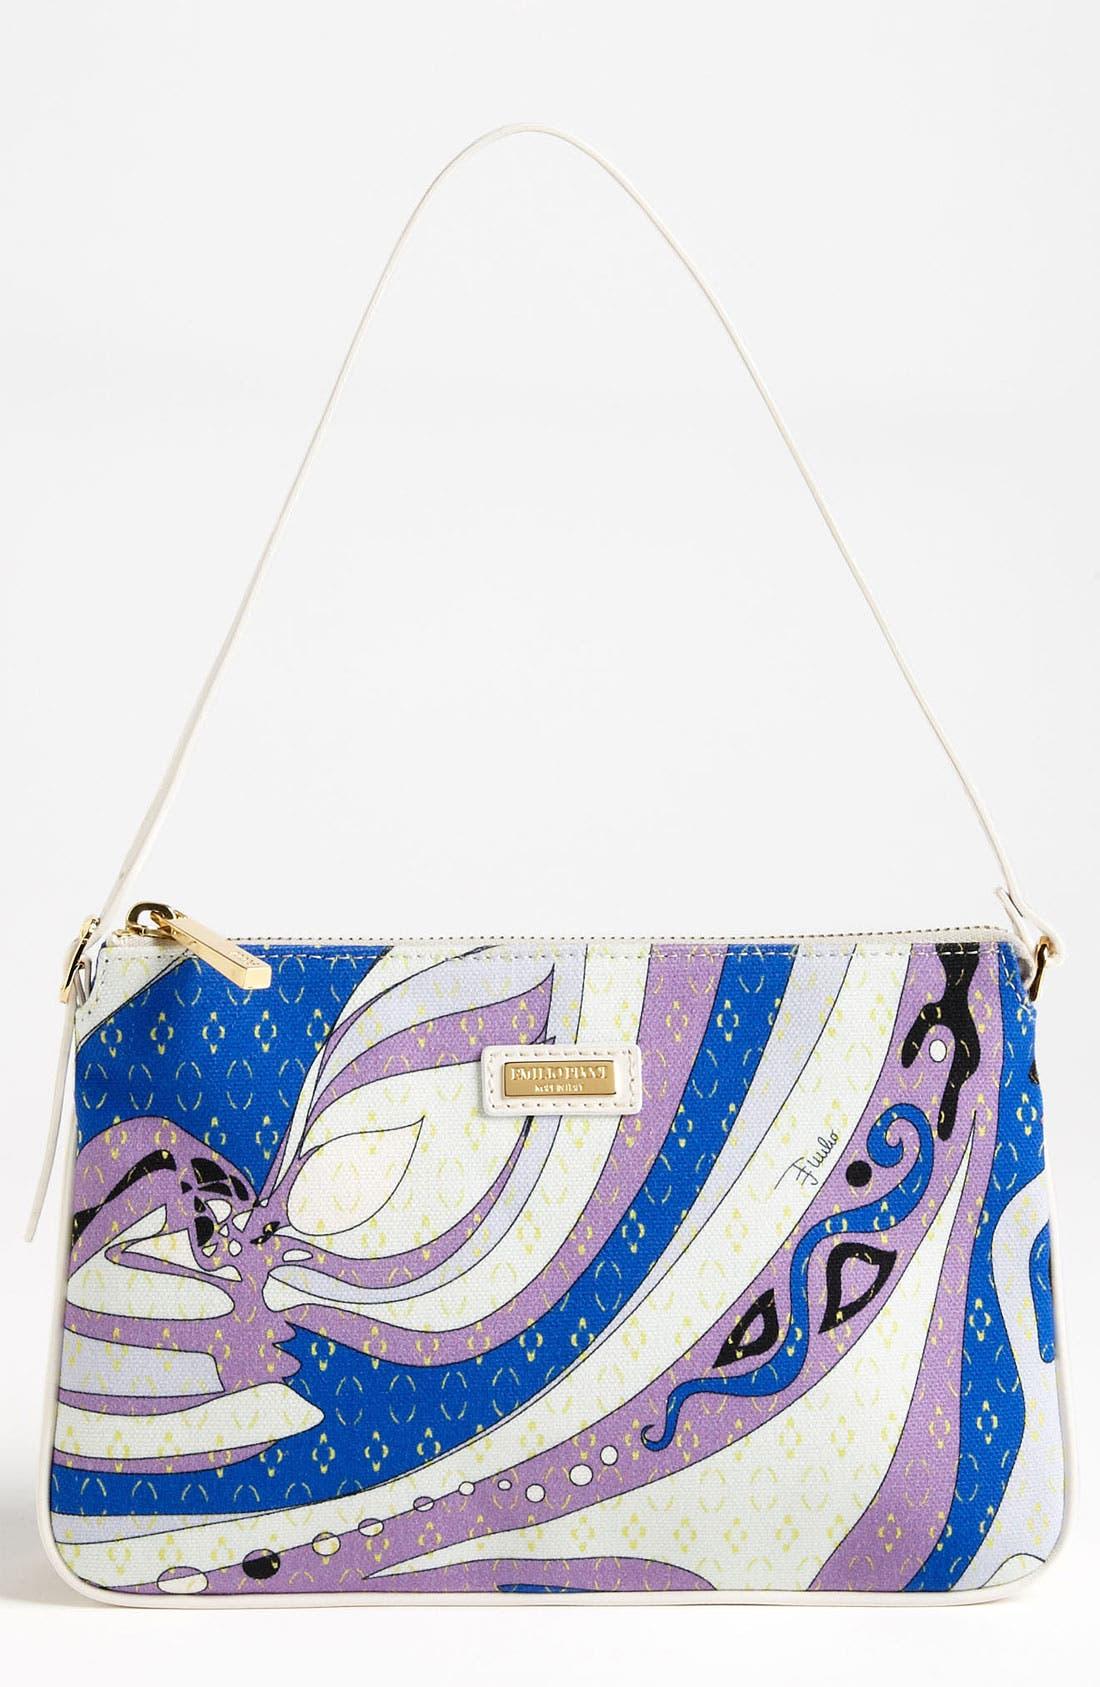 Alternate Image 1 Selected - Emilio Pucci 'Mini' Bag